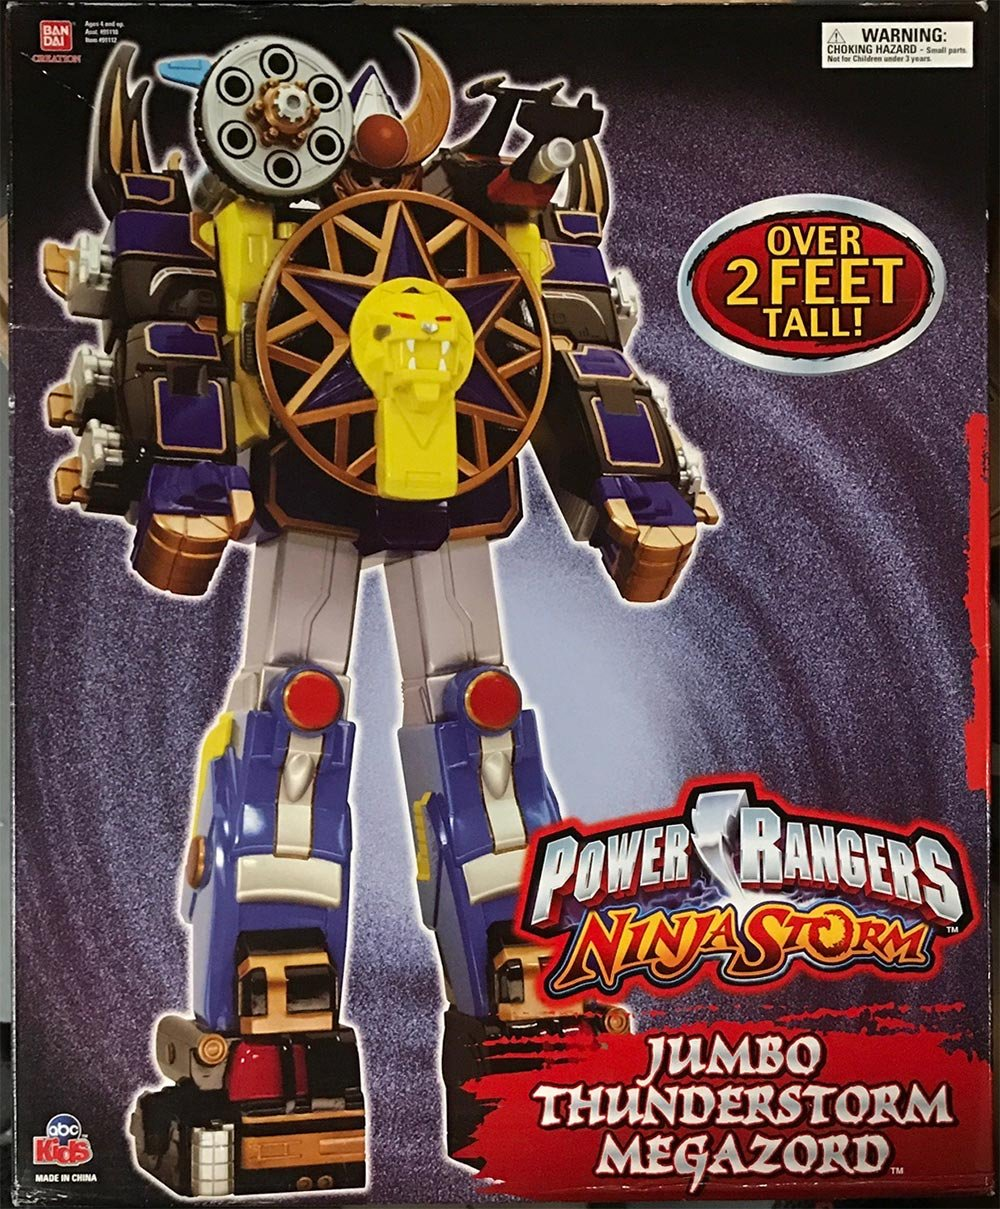 "Power Rangers Ninja Storm /""Thunderstorm Action Megazord/"""